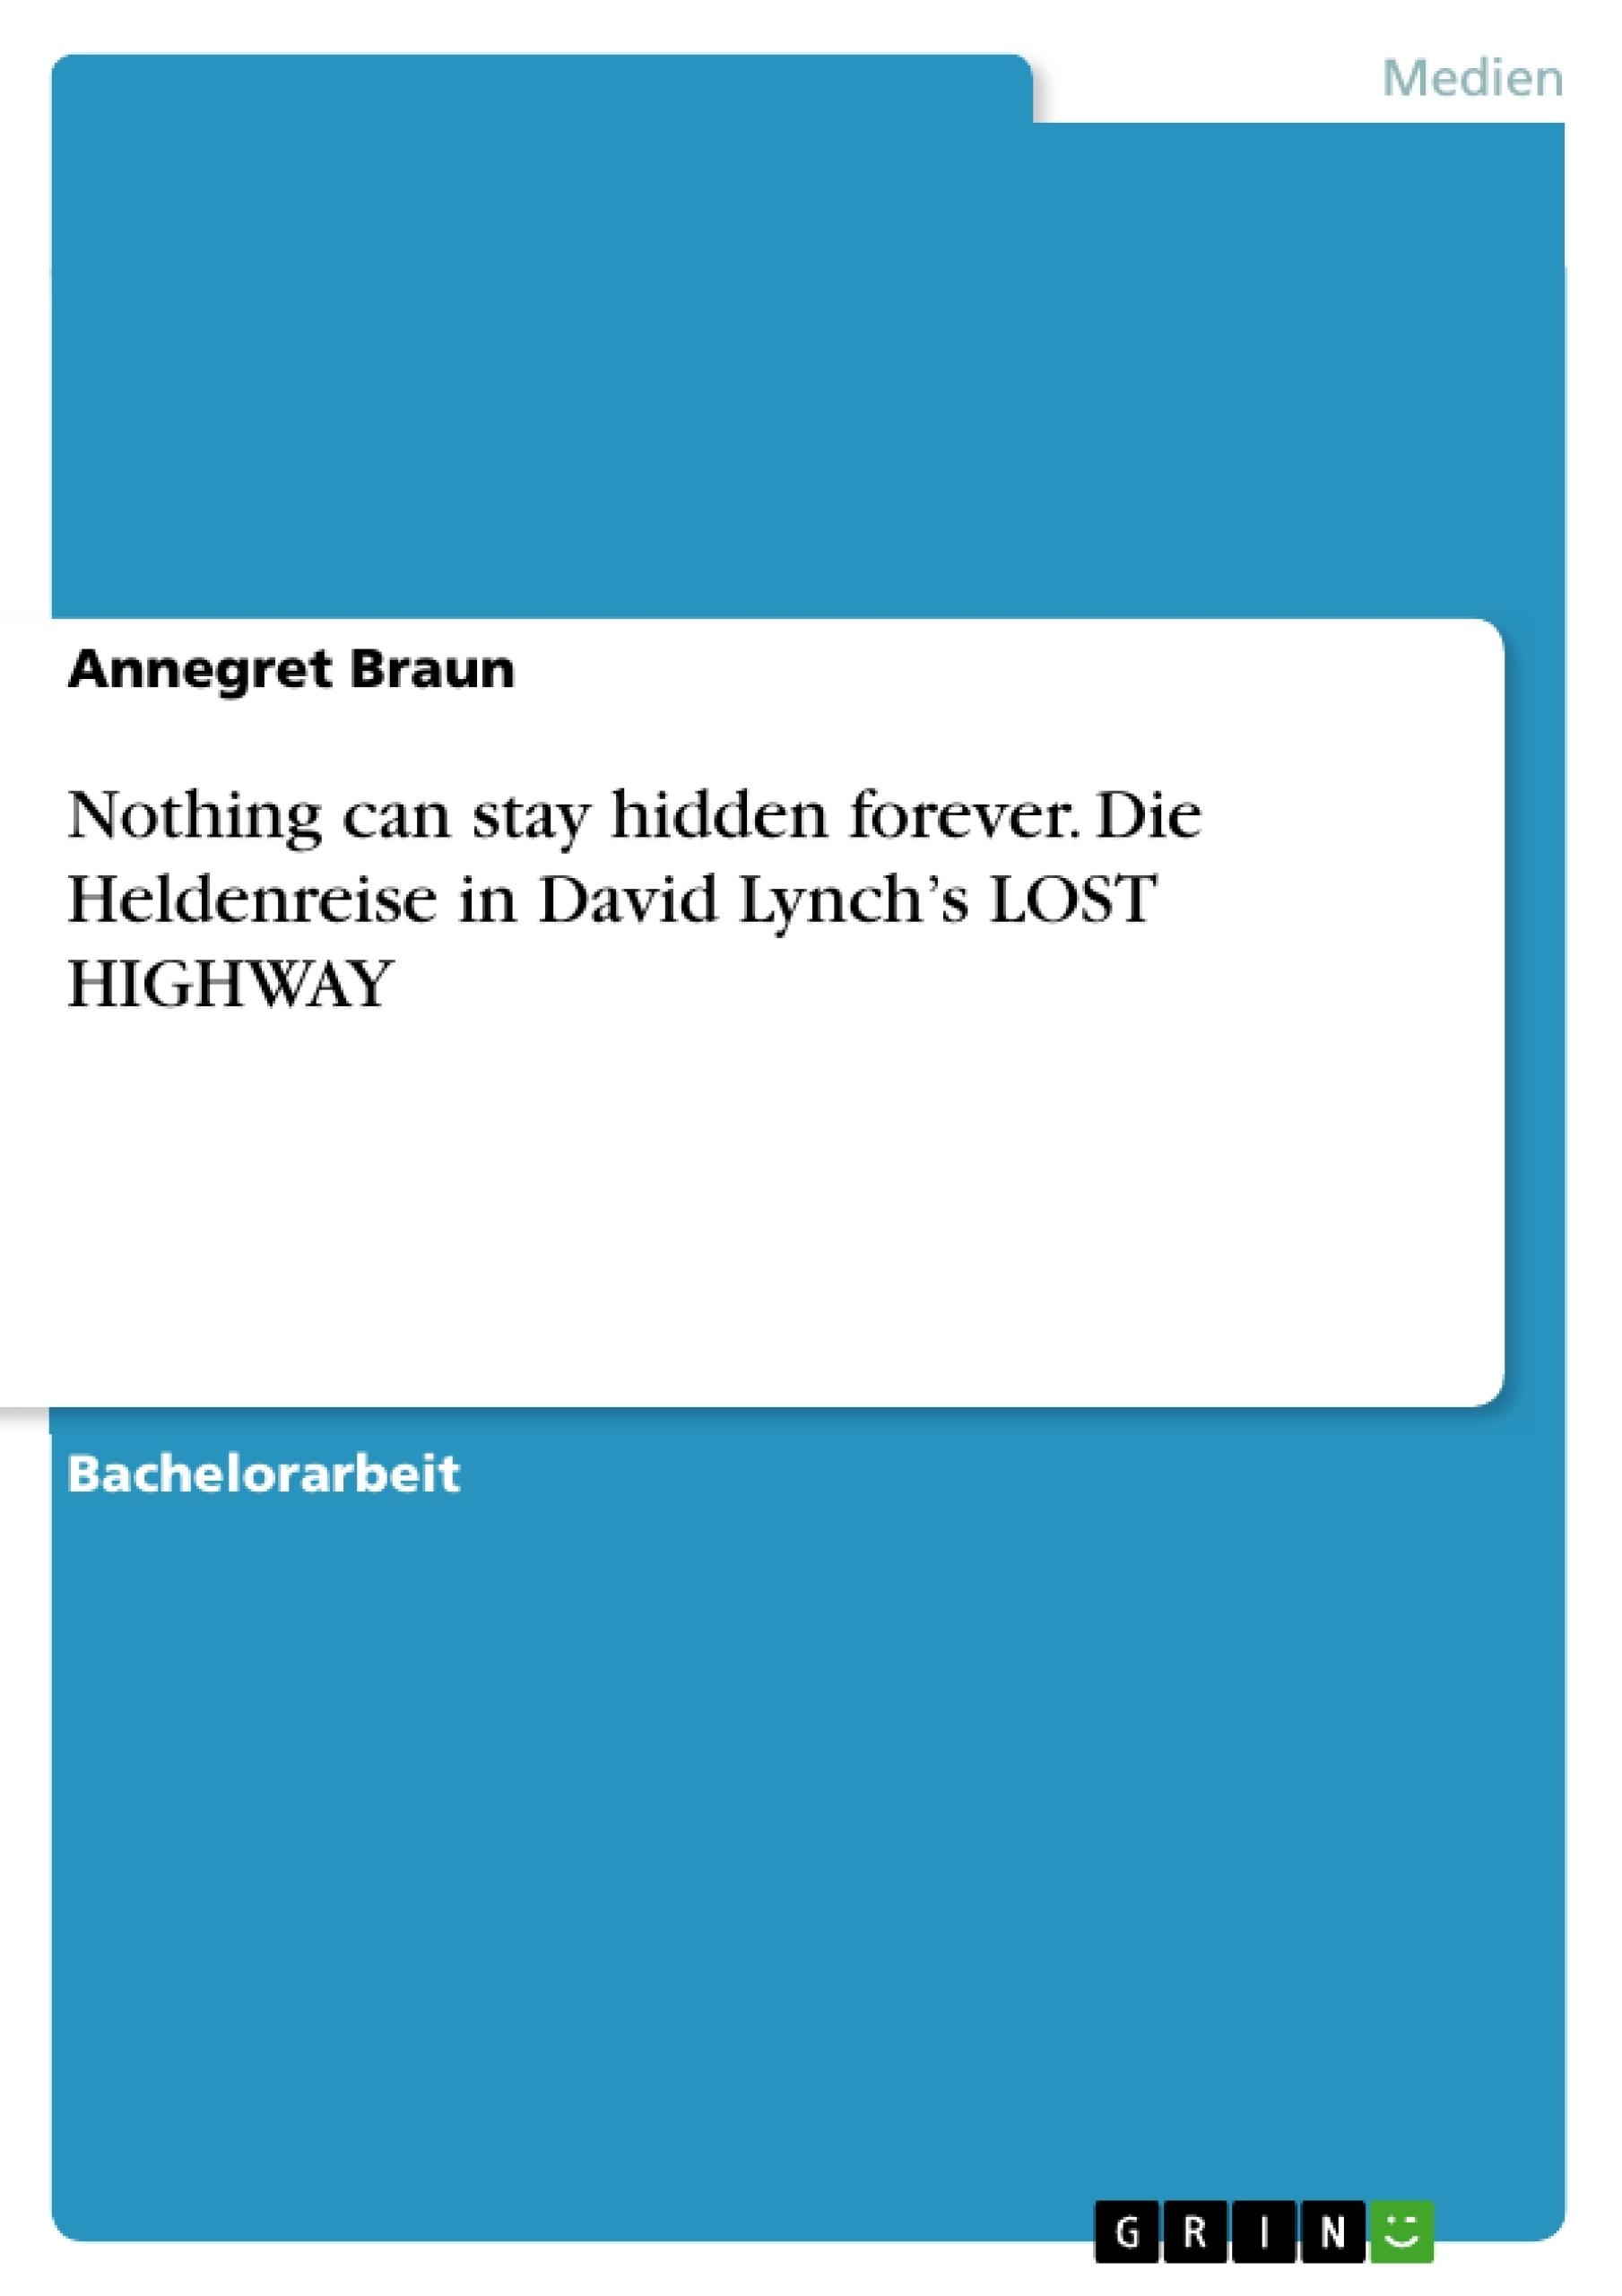 Titel: Nothing can stay hidden forever. Die Heldenreise in David Lynch's LOST HIGHWAY